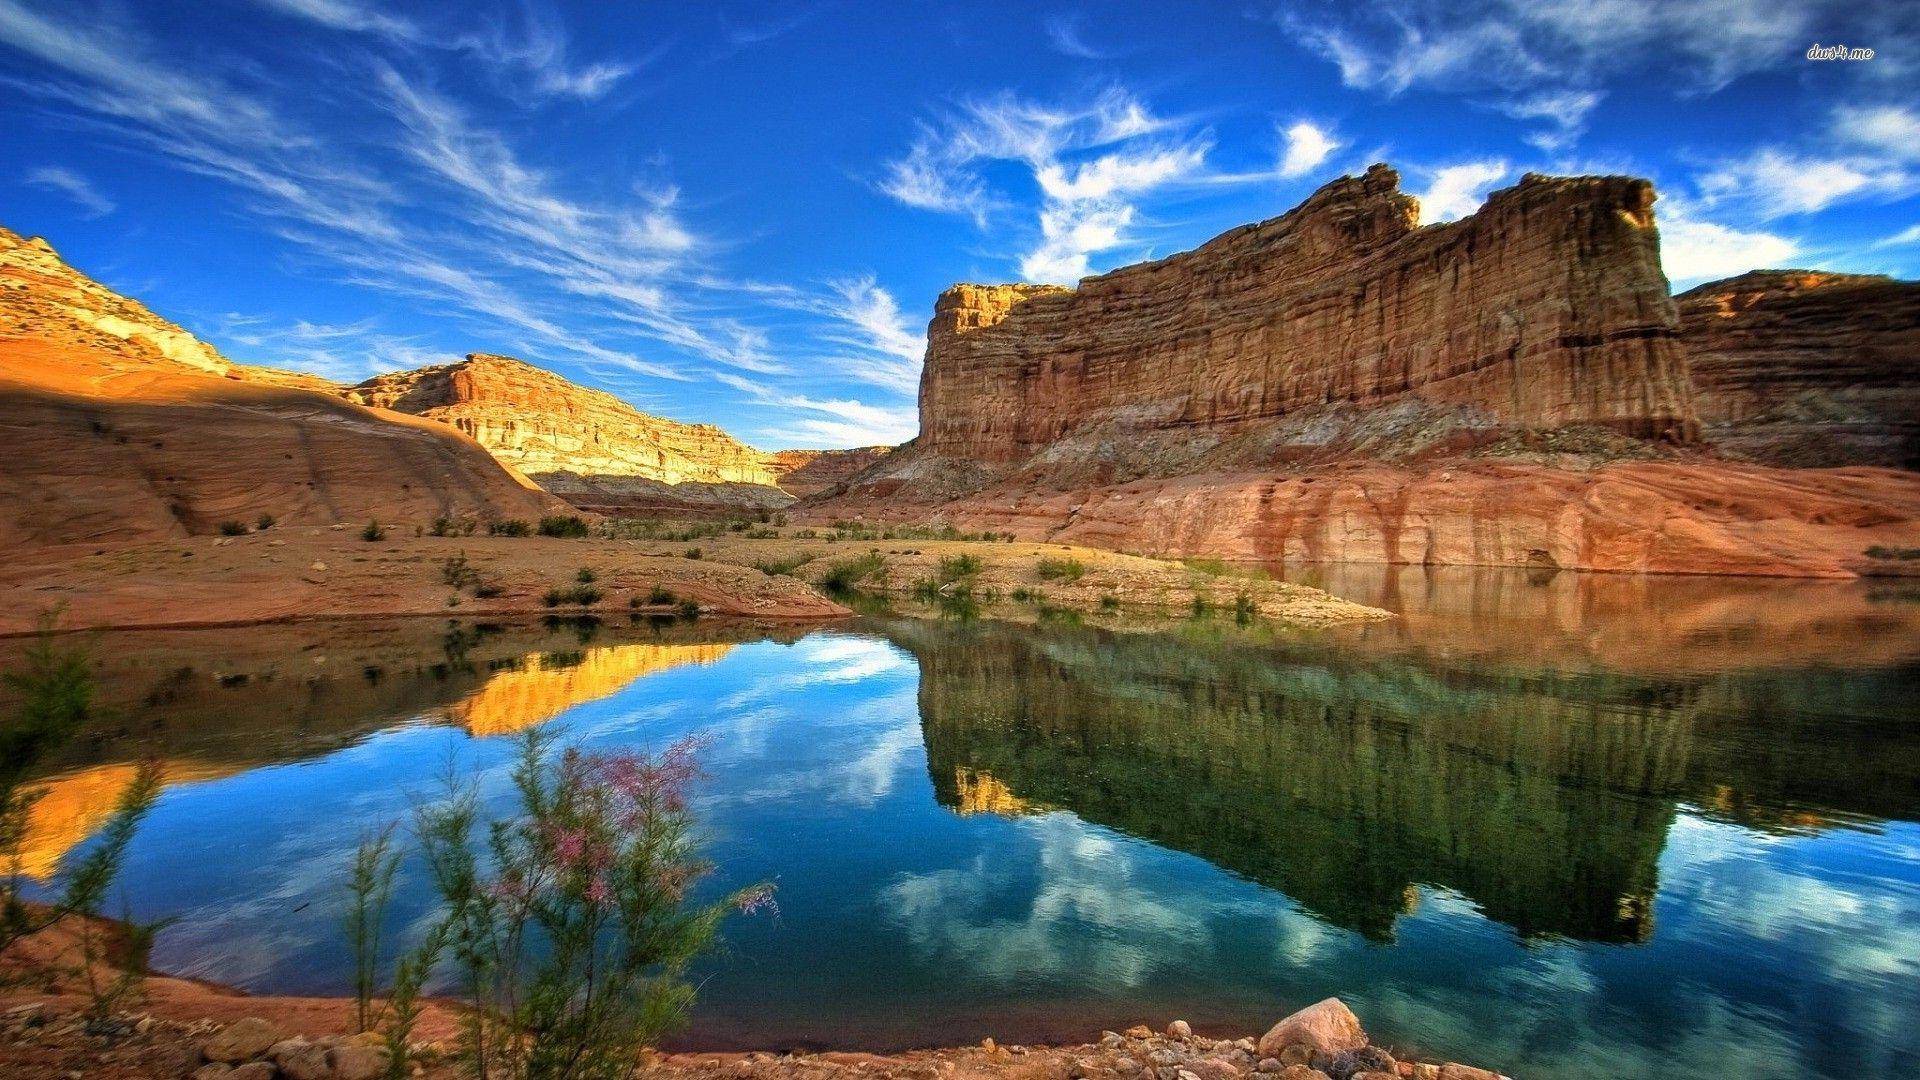 Grand Canyon clipart hd wallpaper Graphics) Adorable Wallpaper BsnSCB Canyon